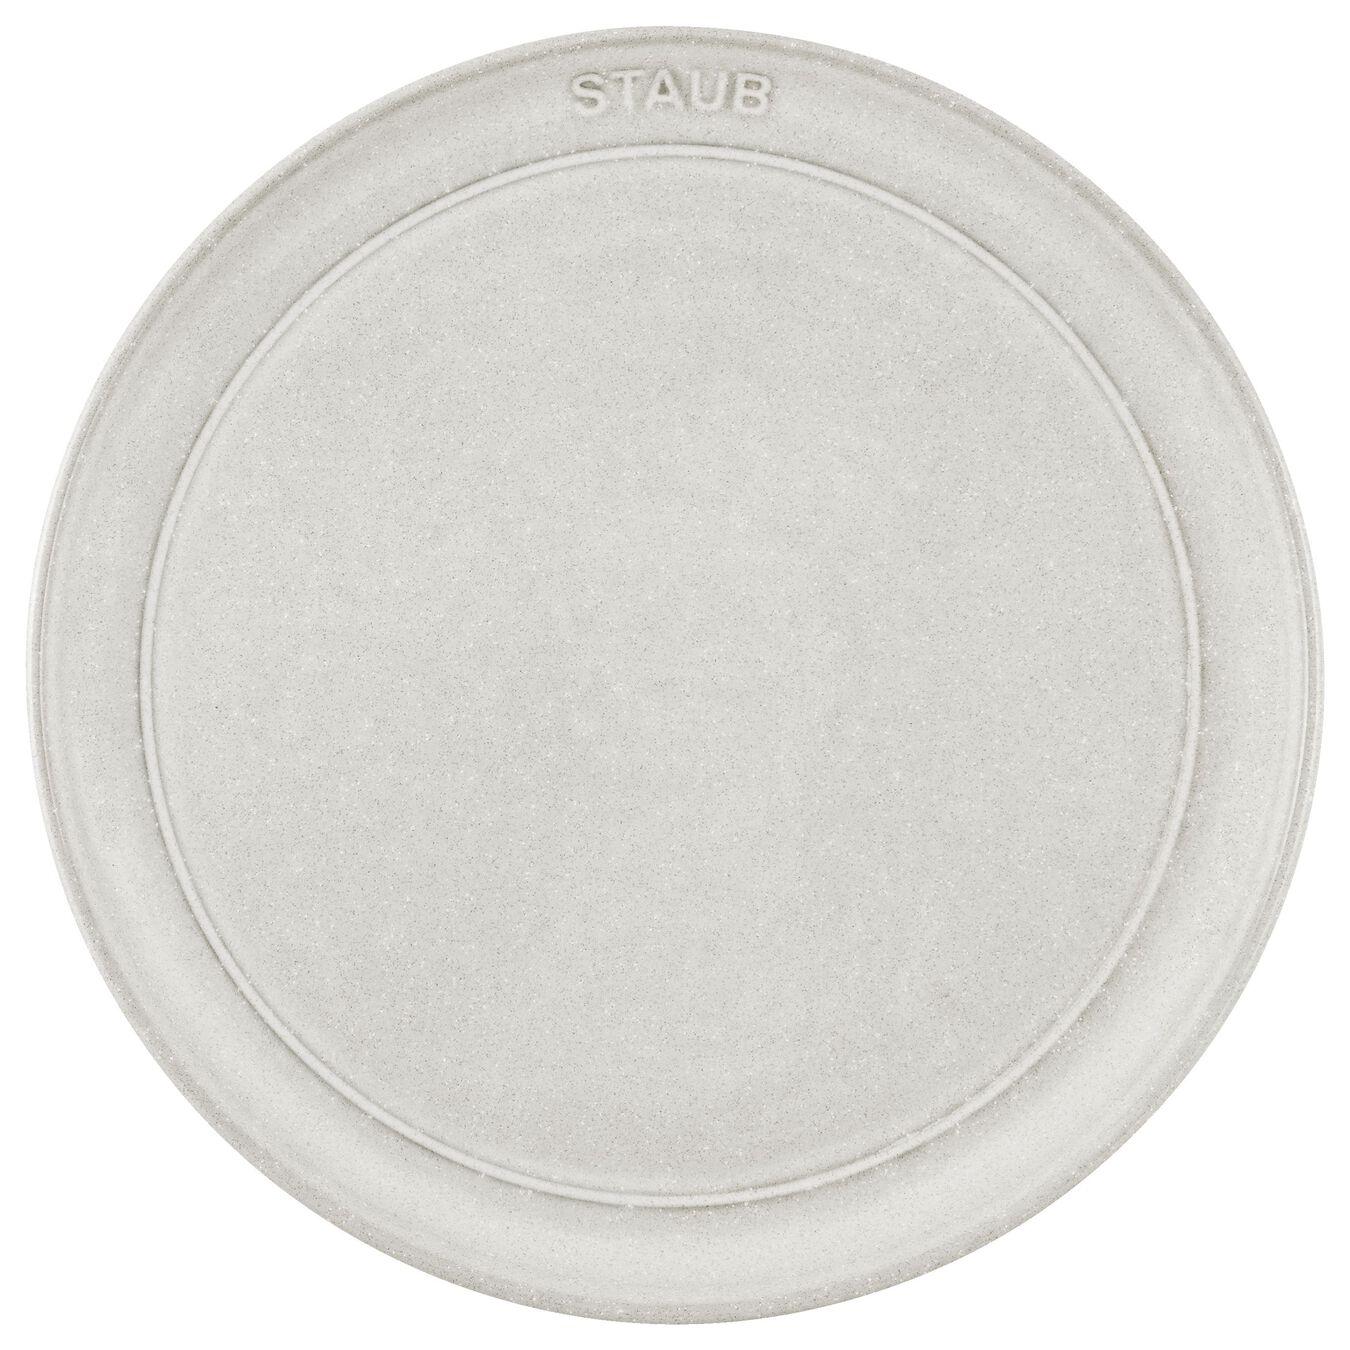 Teller flach 22 cm, Keramik, Weisser Trüffel,,large 2